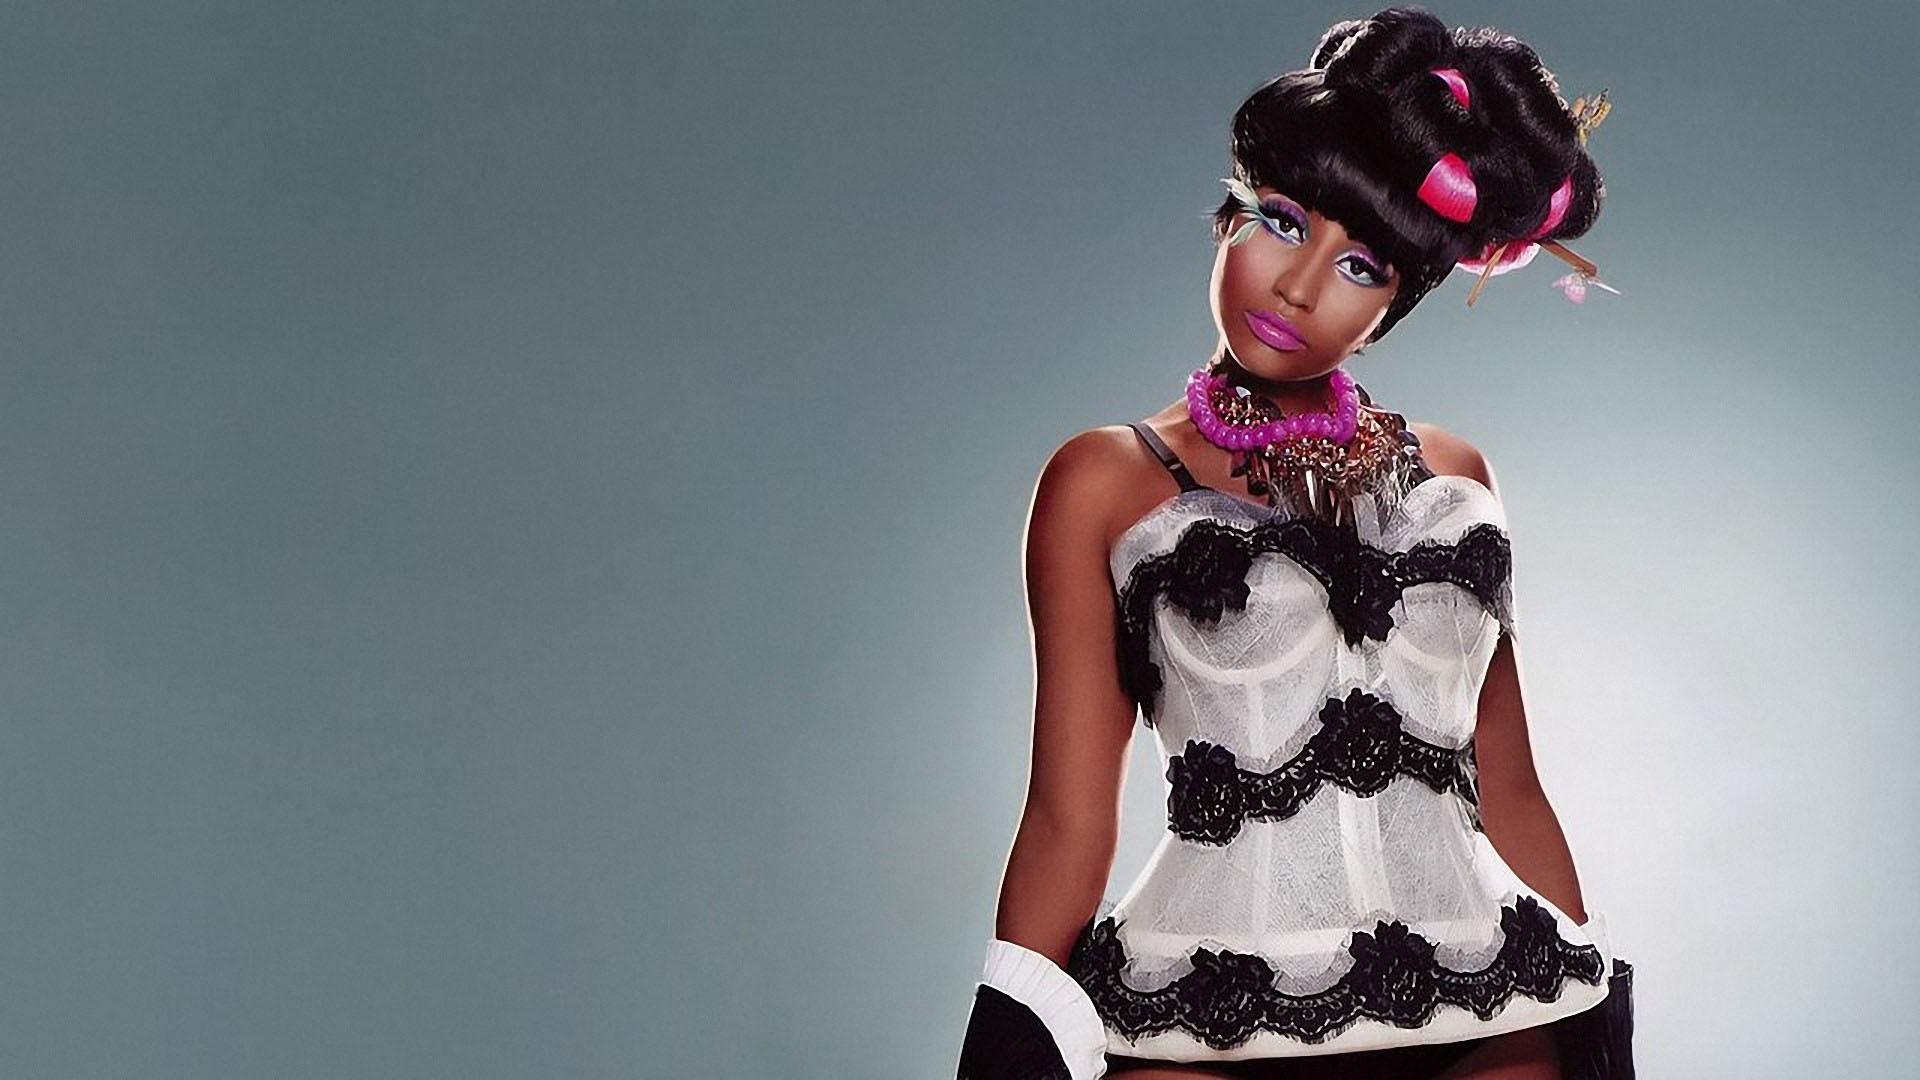 Res: 1920x1080, Nicki Minaj 1080p Pics